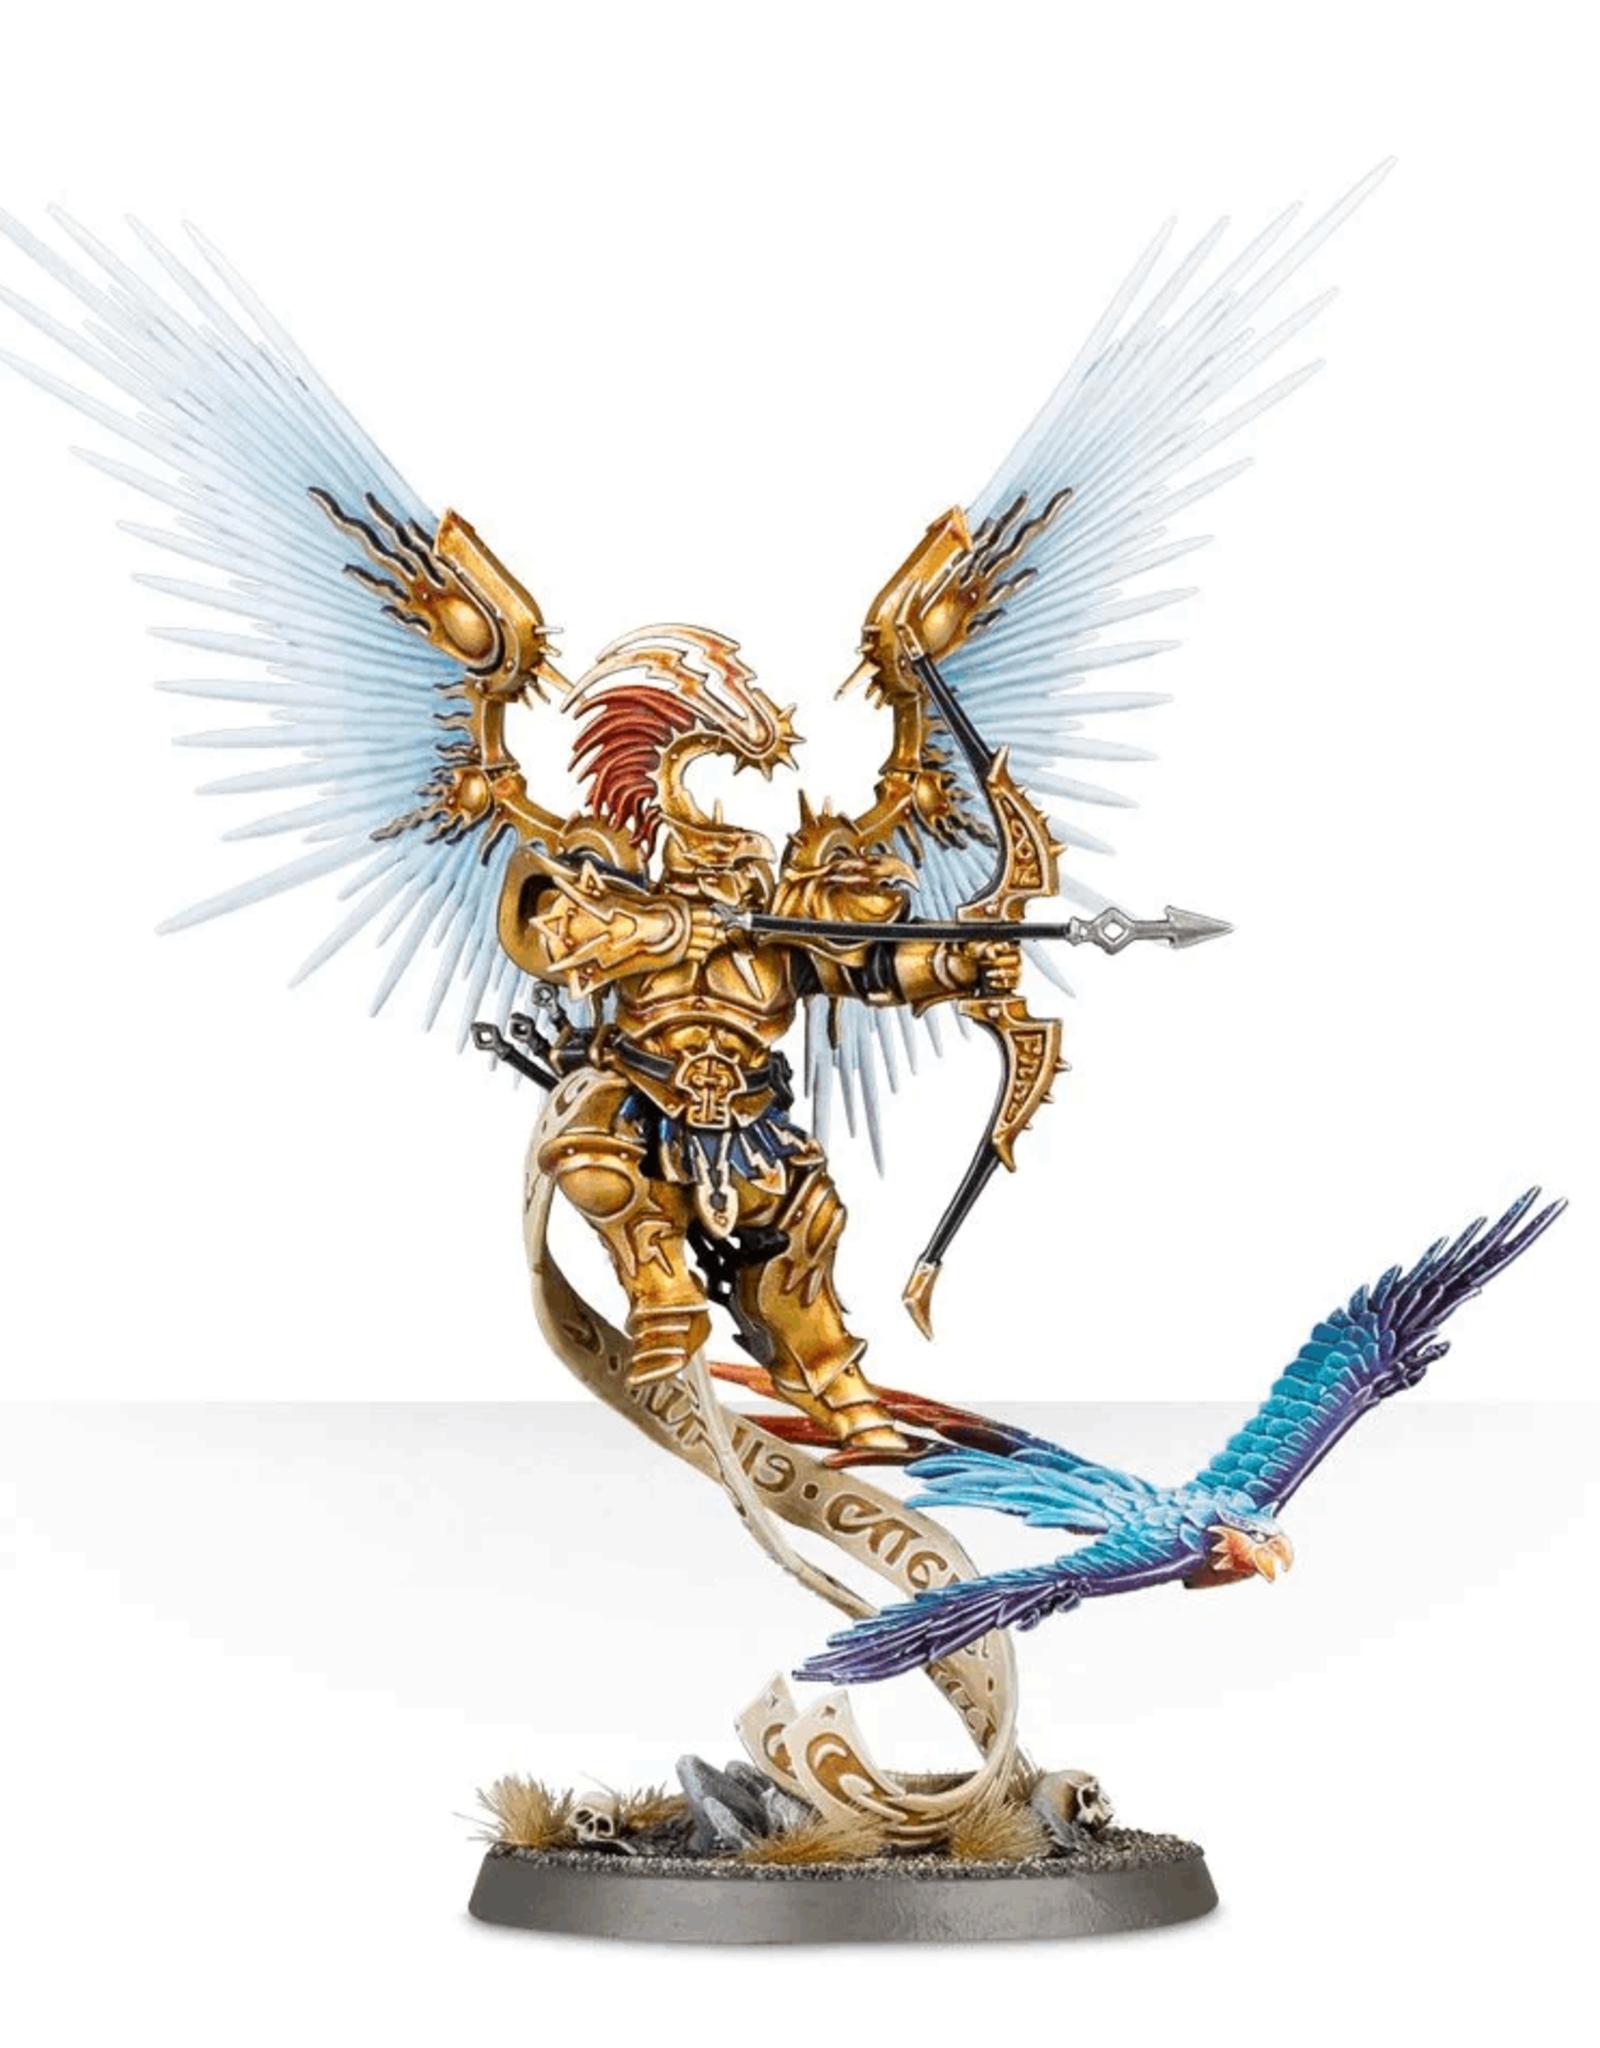 Age of Sigmar Stormcast Eternals - Knight Azyros/Venator